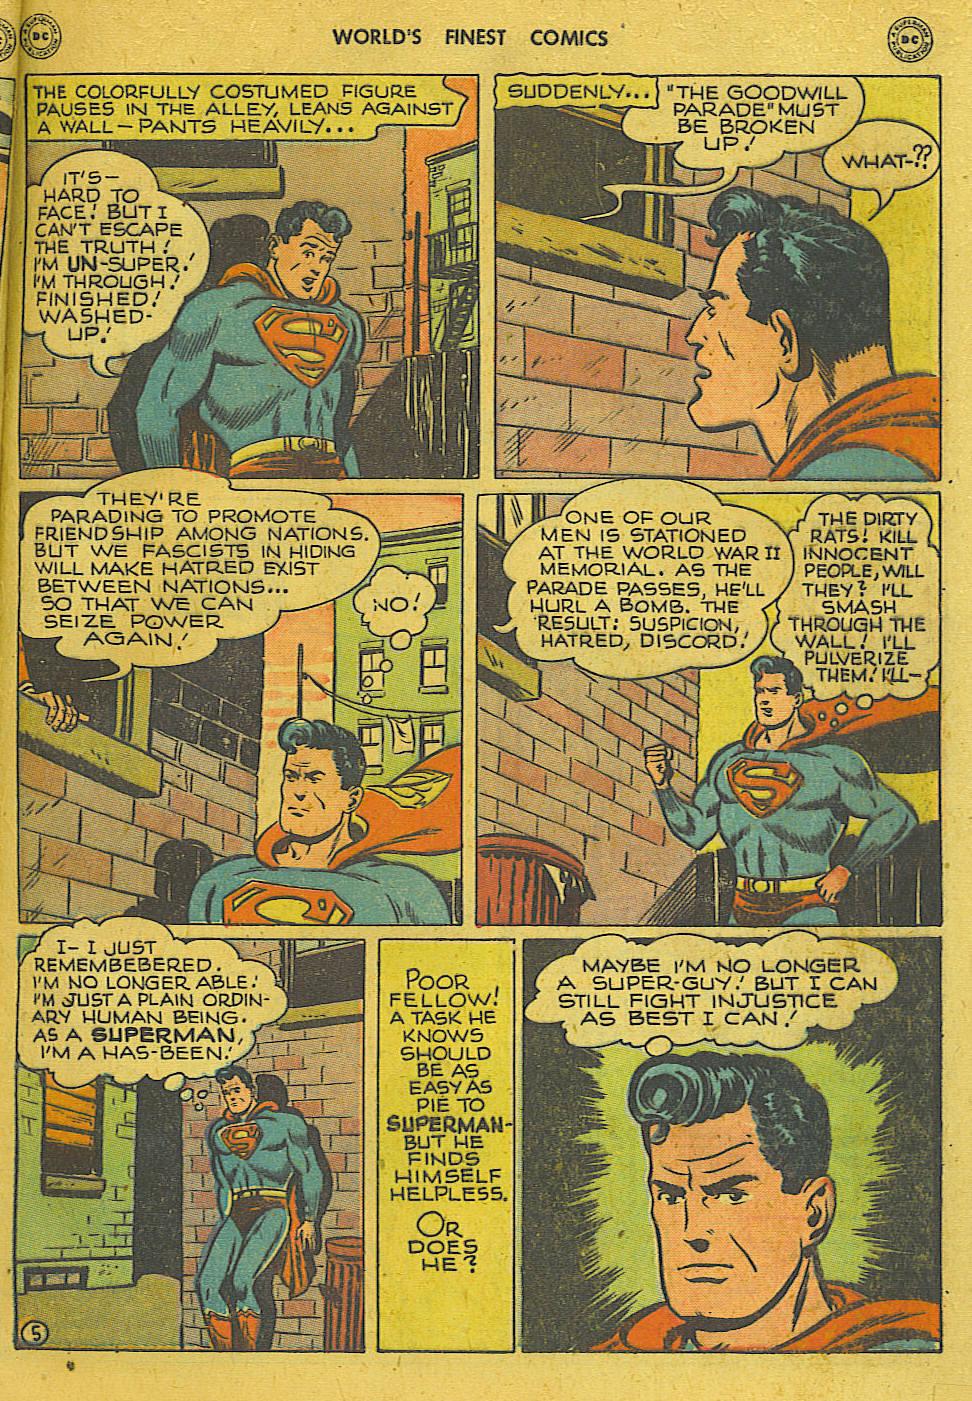 Read online World's Finest Comics comic -  Issue #34 - 7